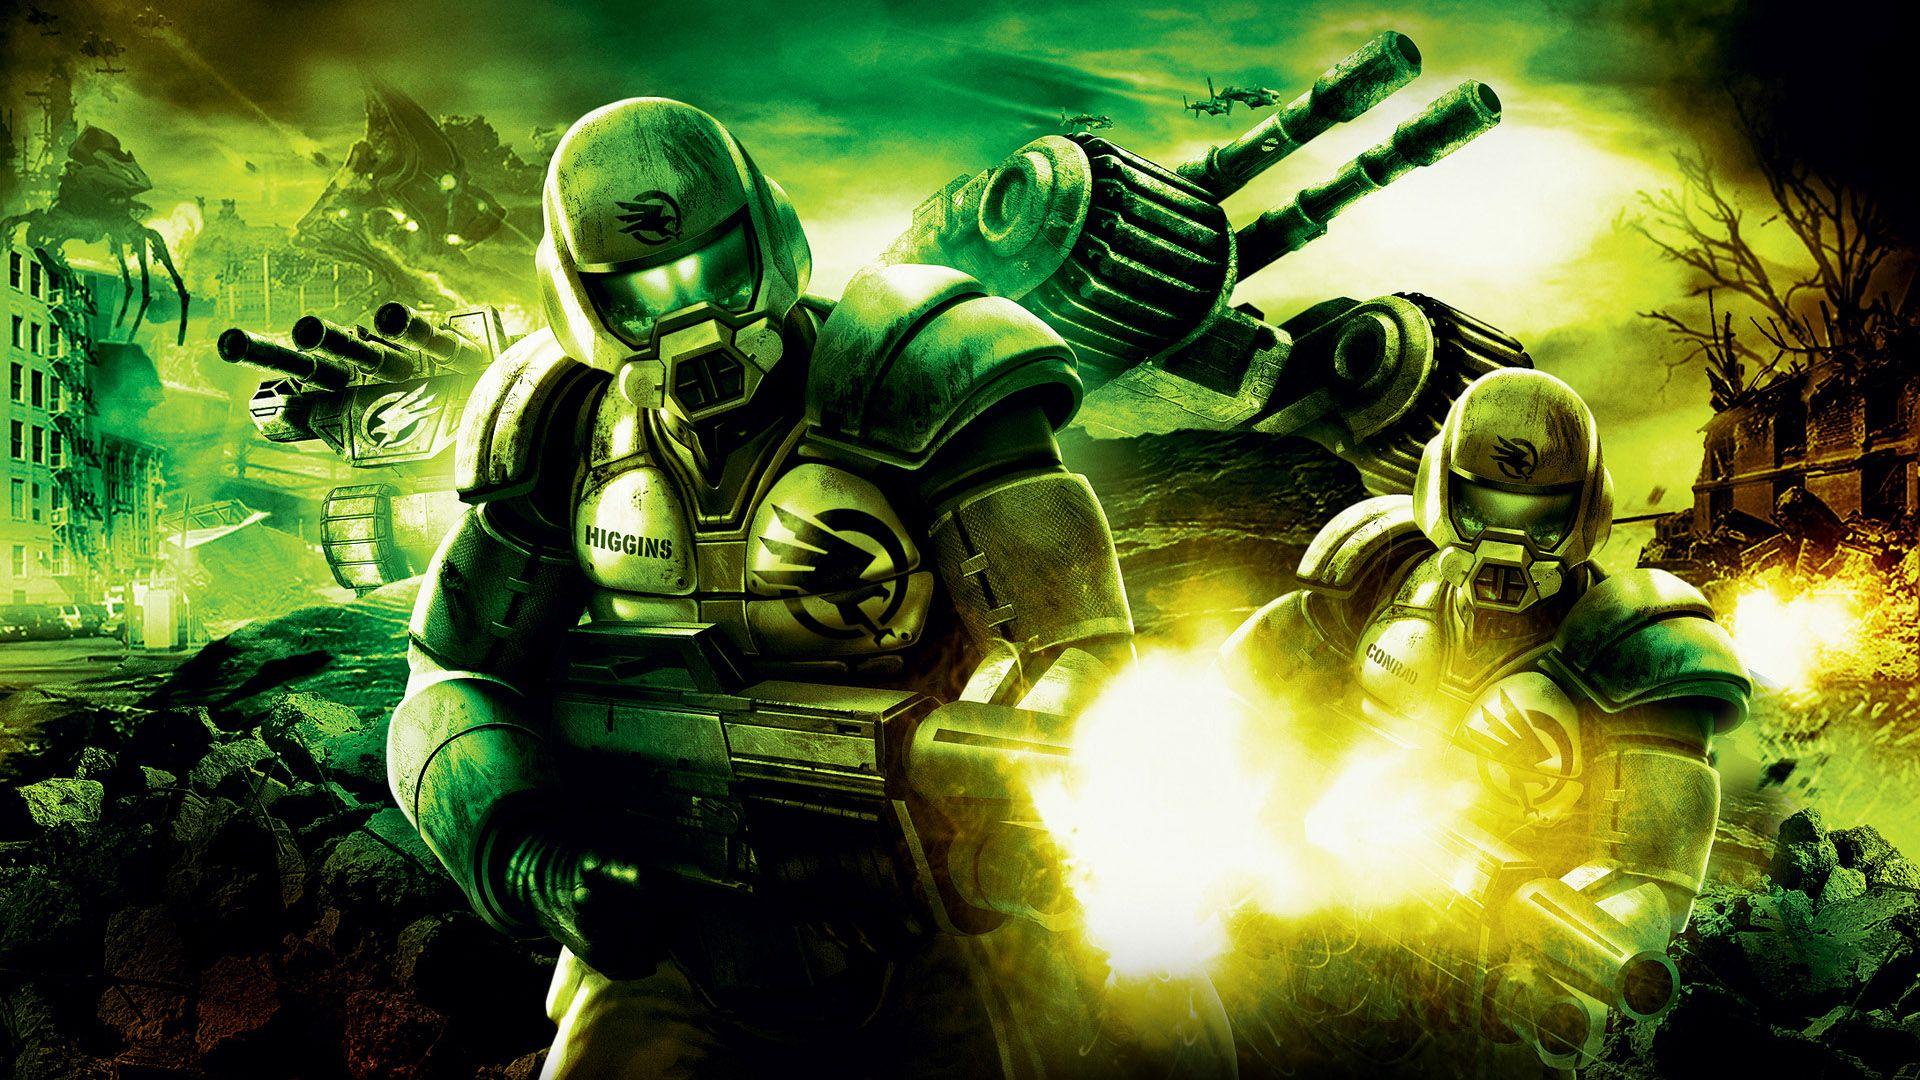 hd action game walllpaper wallpaper for desktop background 134680